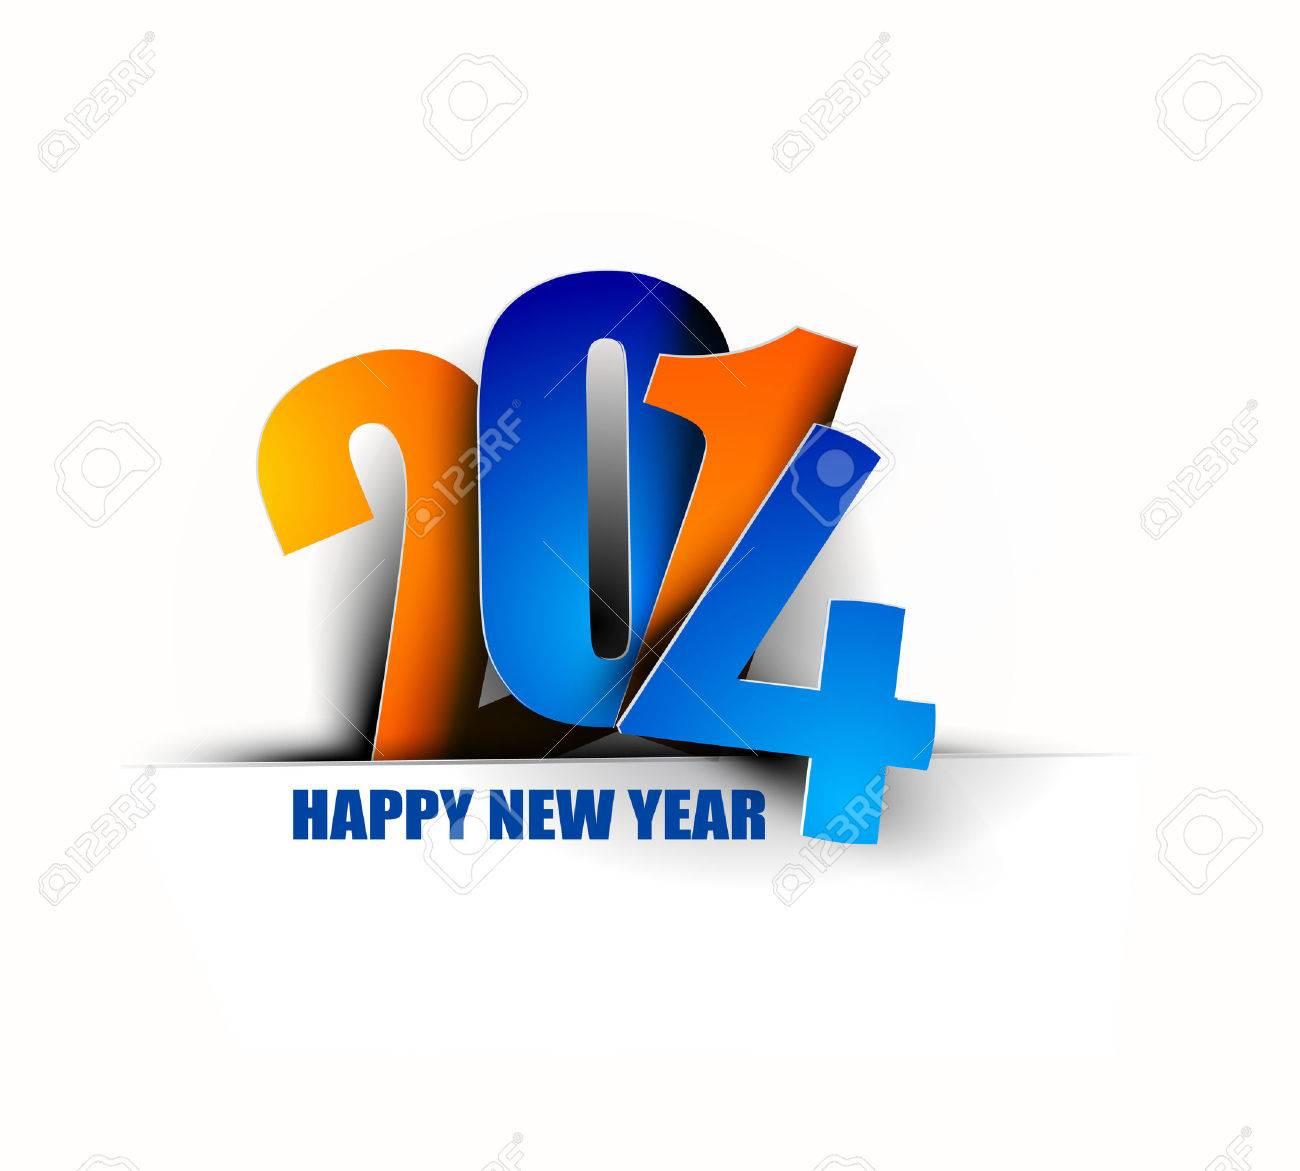 Happy New Year 2014 Text Design Stock Vector - 24052117